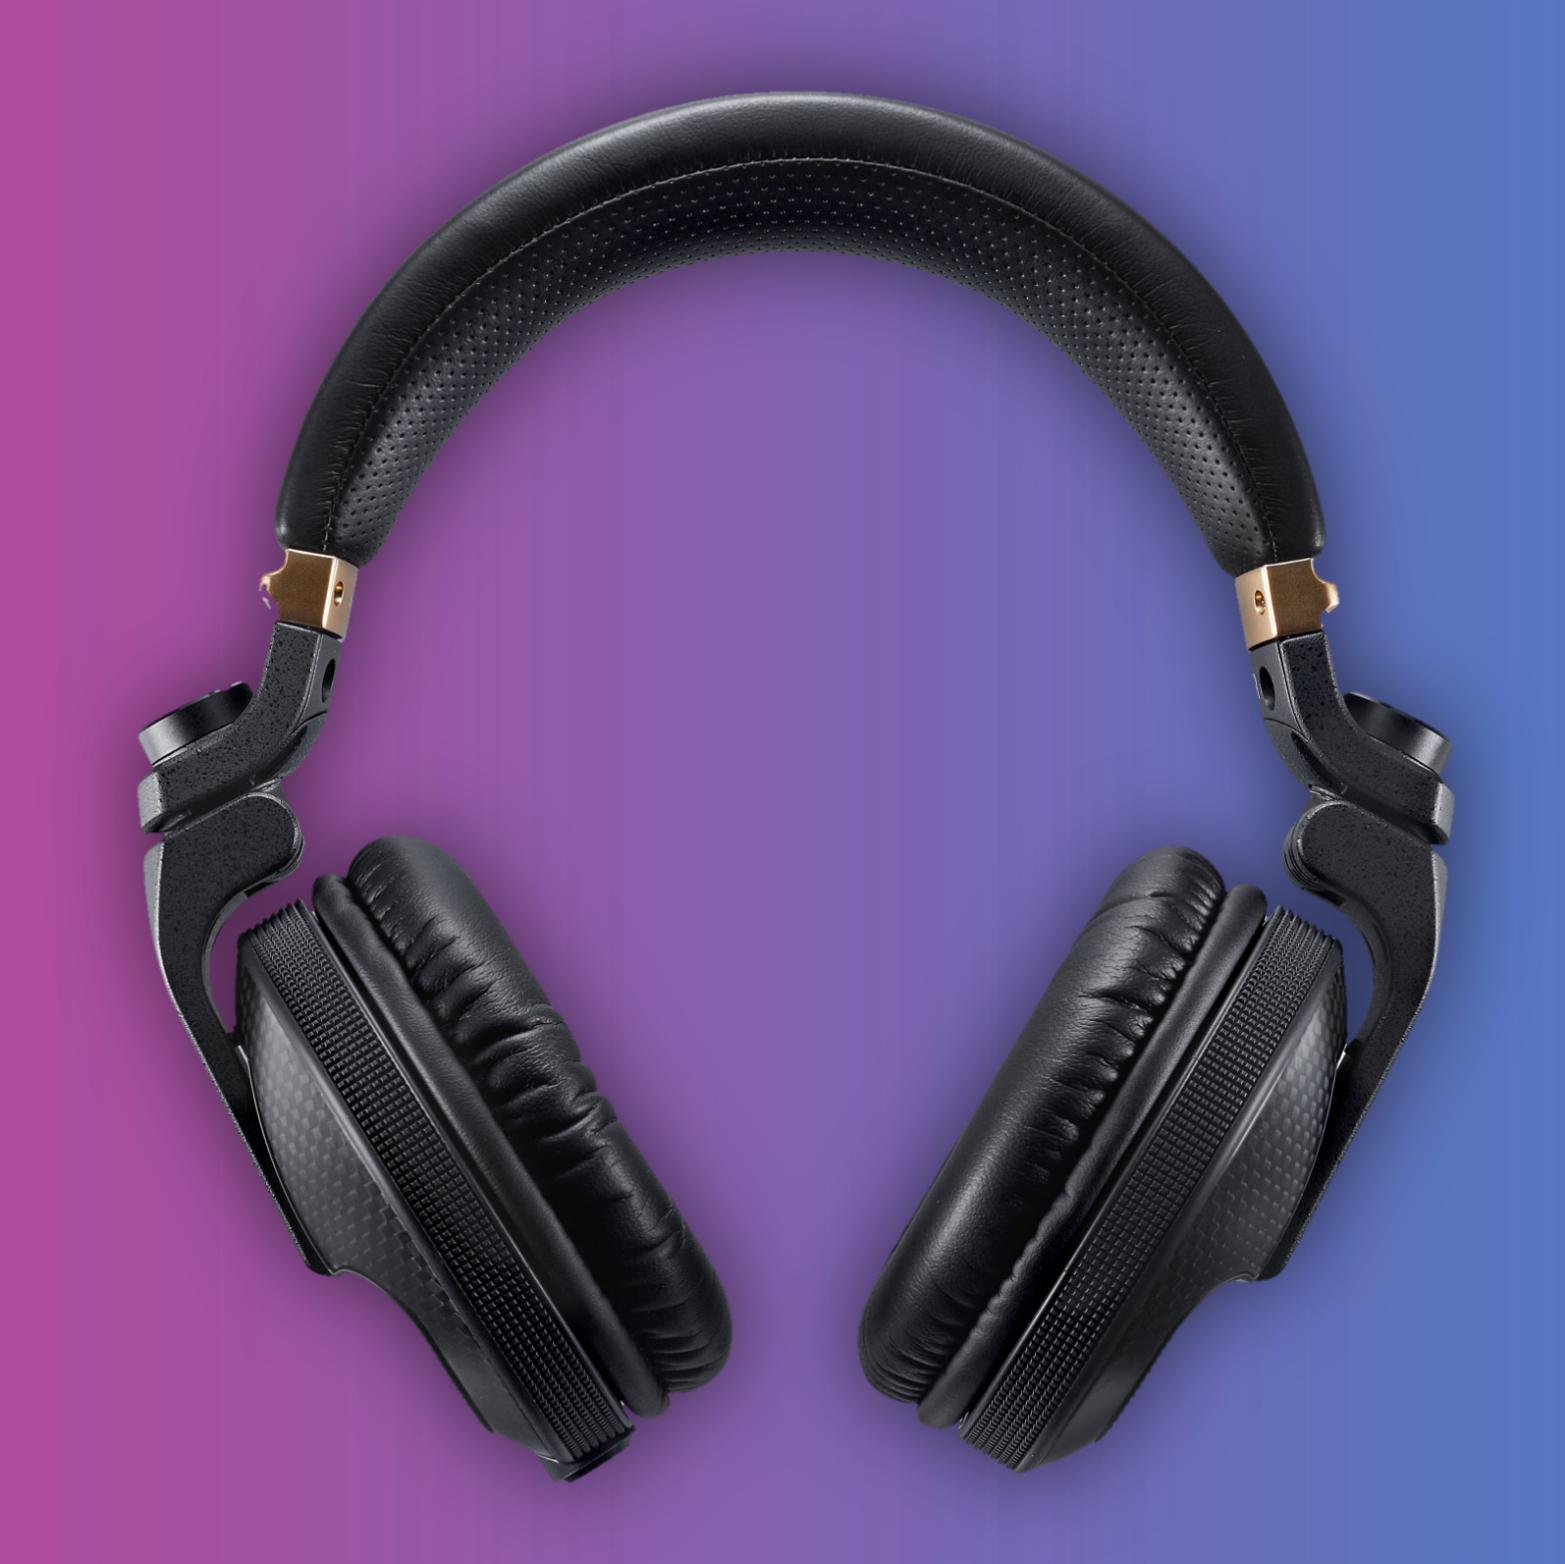 Pioneer HDJ-X10C: Over-Ear Kopfhörer (50mm Treiber, 32Ω, 5Hz - 40kHz, 106dB bei 1mW)